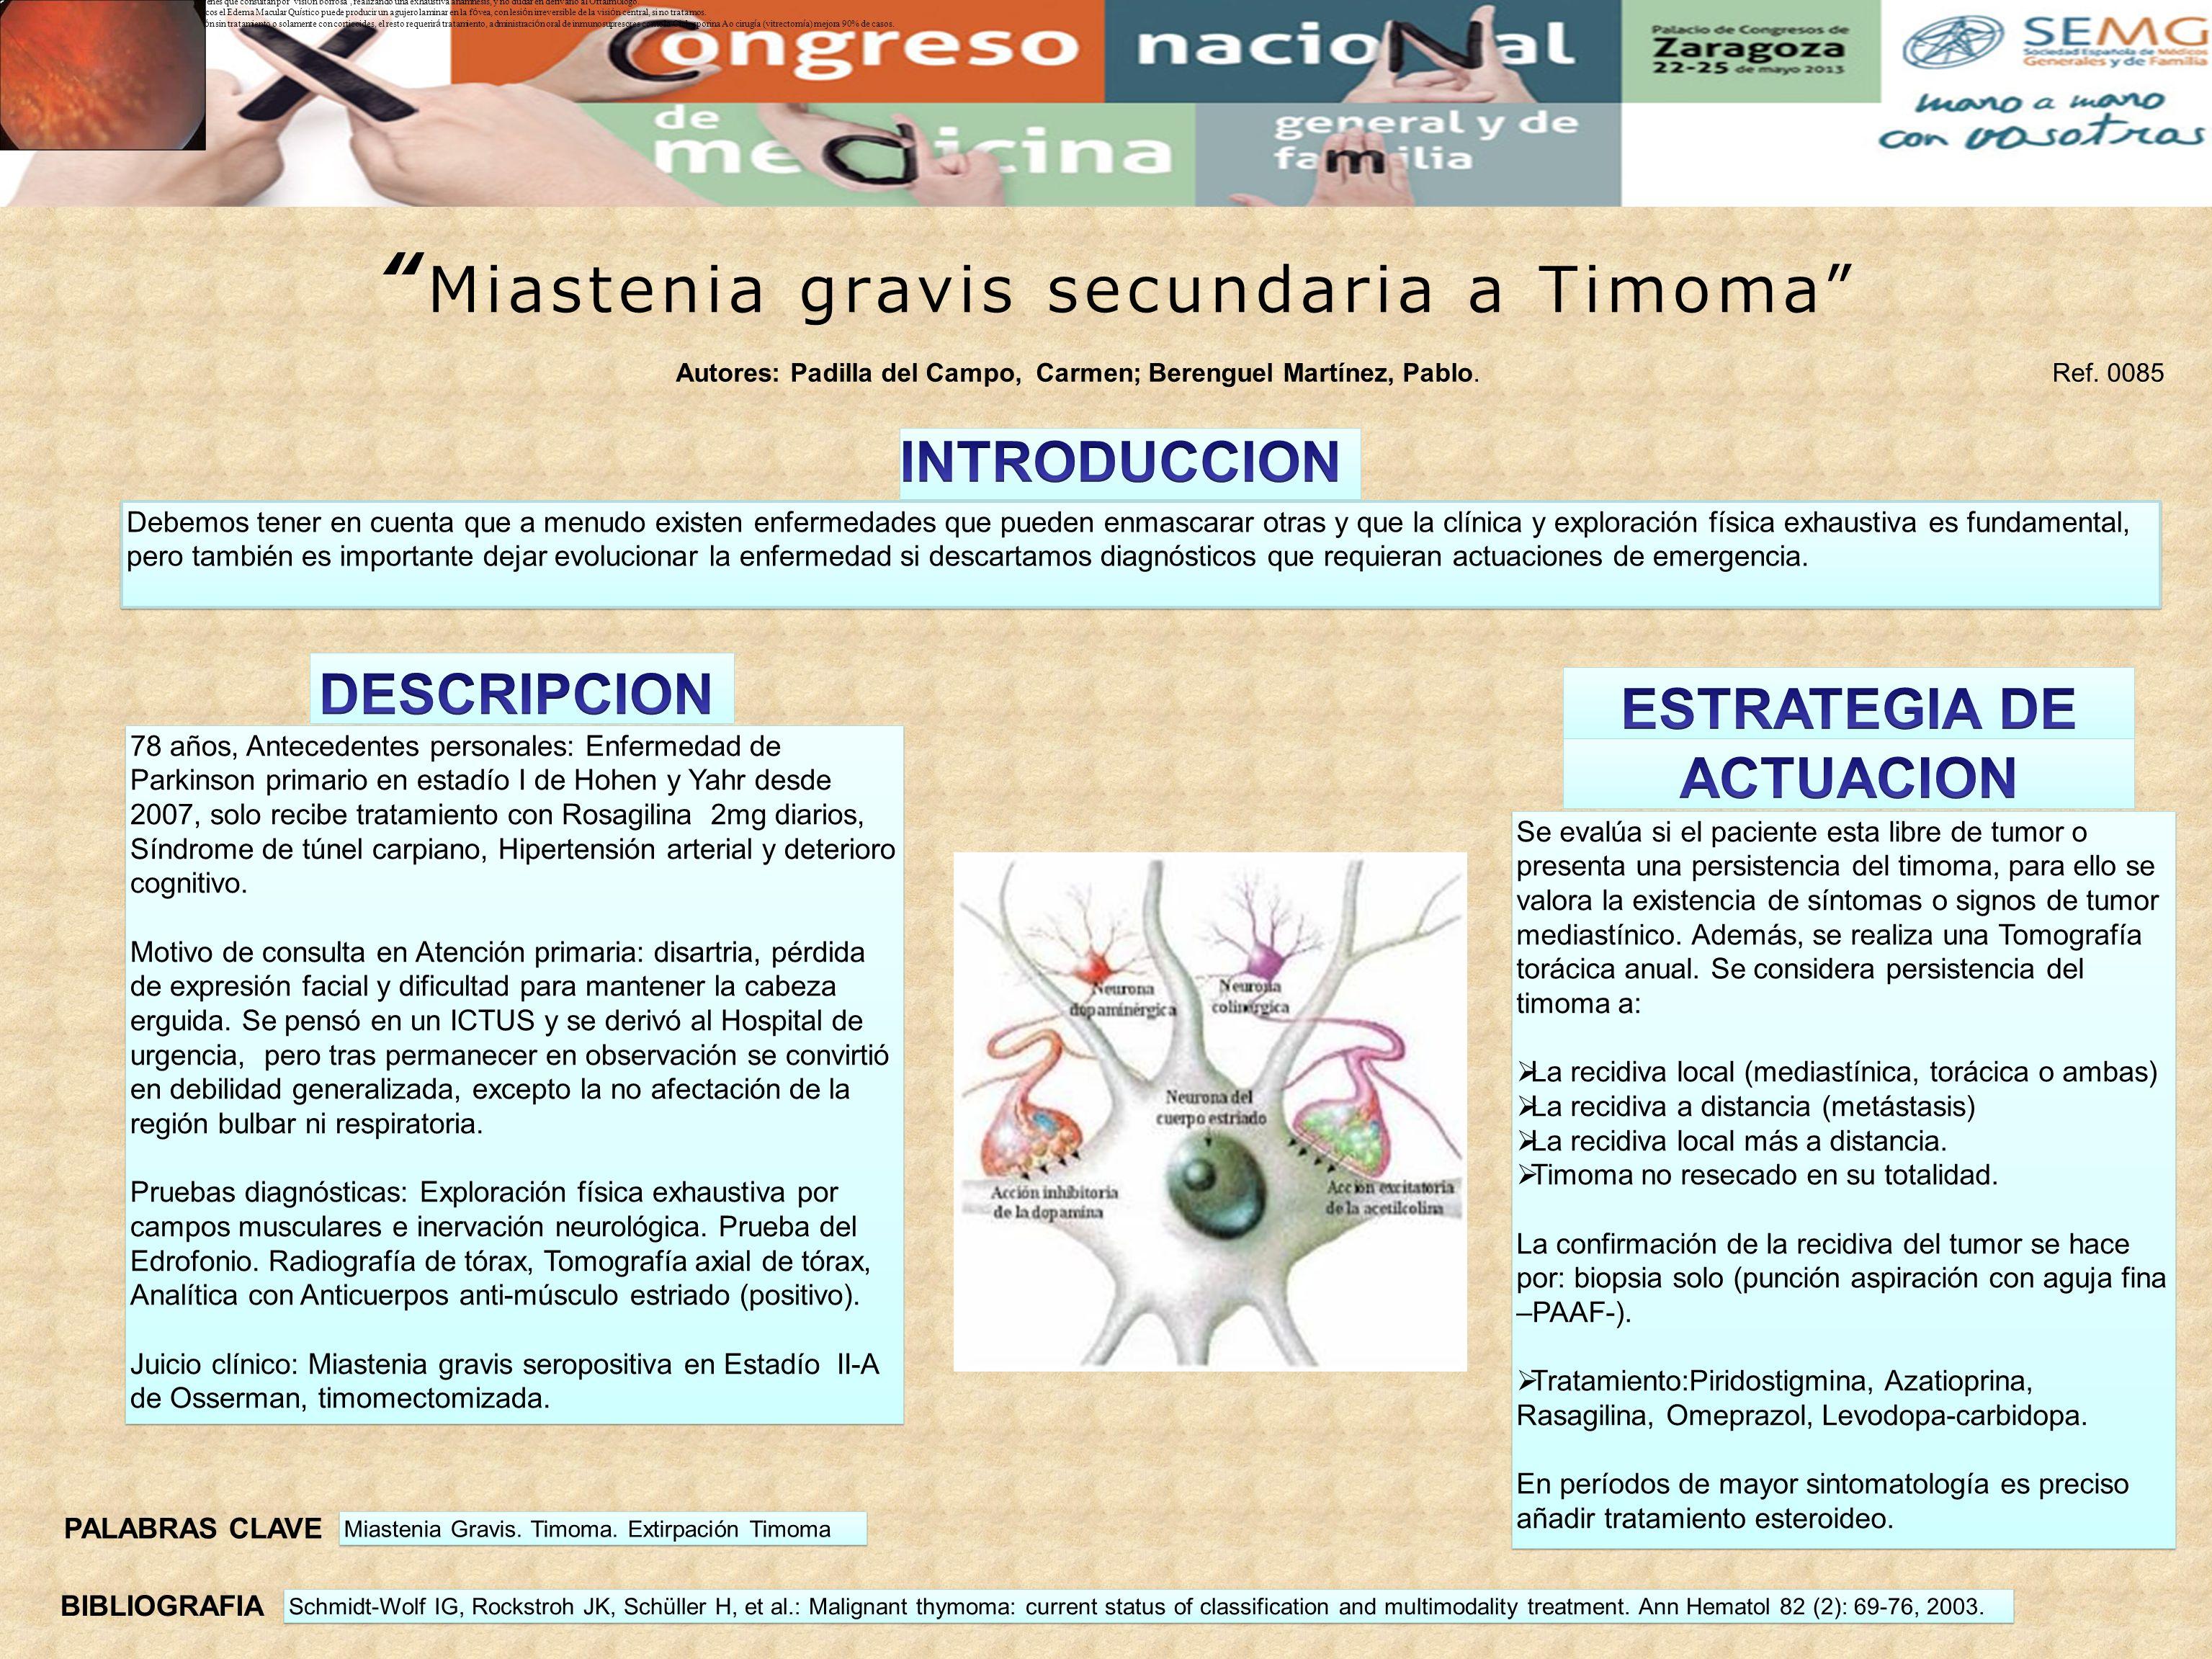 ESTRATEGIA DE ACTUACION